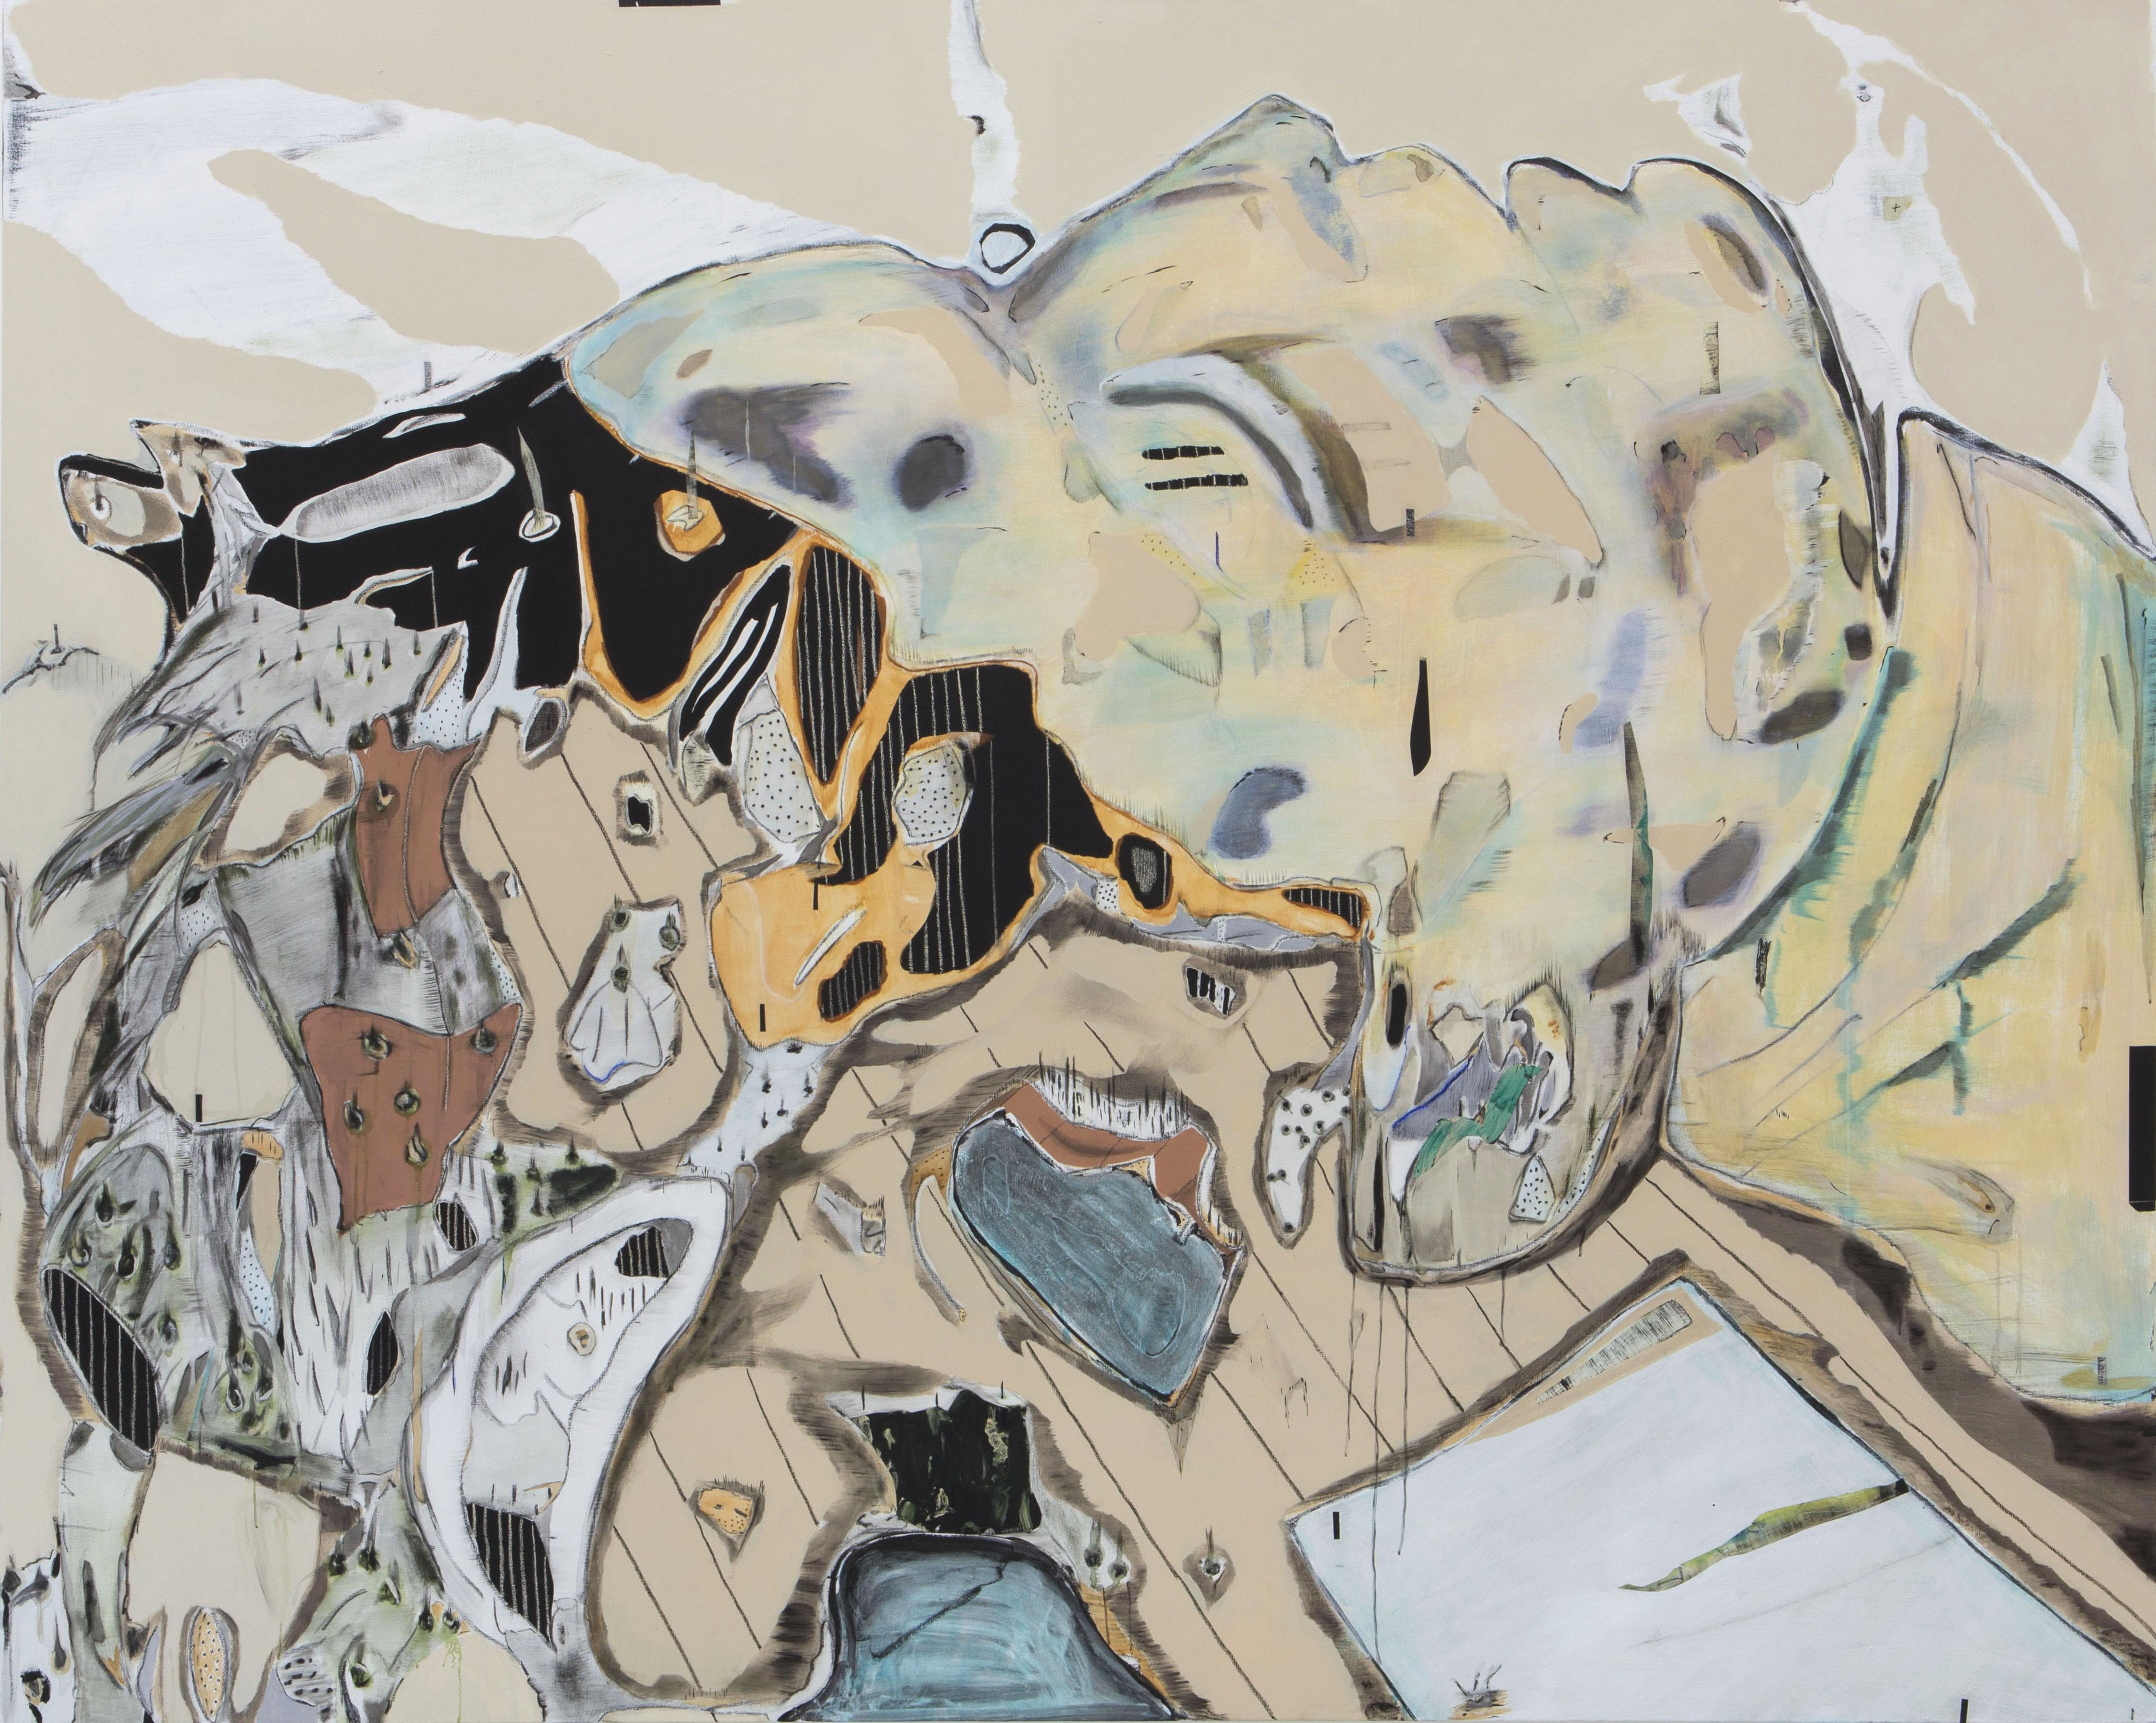 'Zapruder', Manuel Mathieu|© Agnese Sanvito